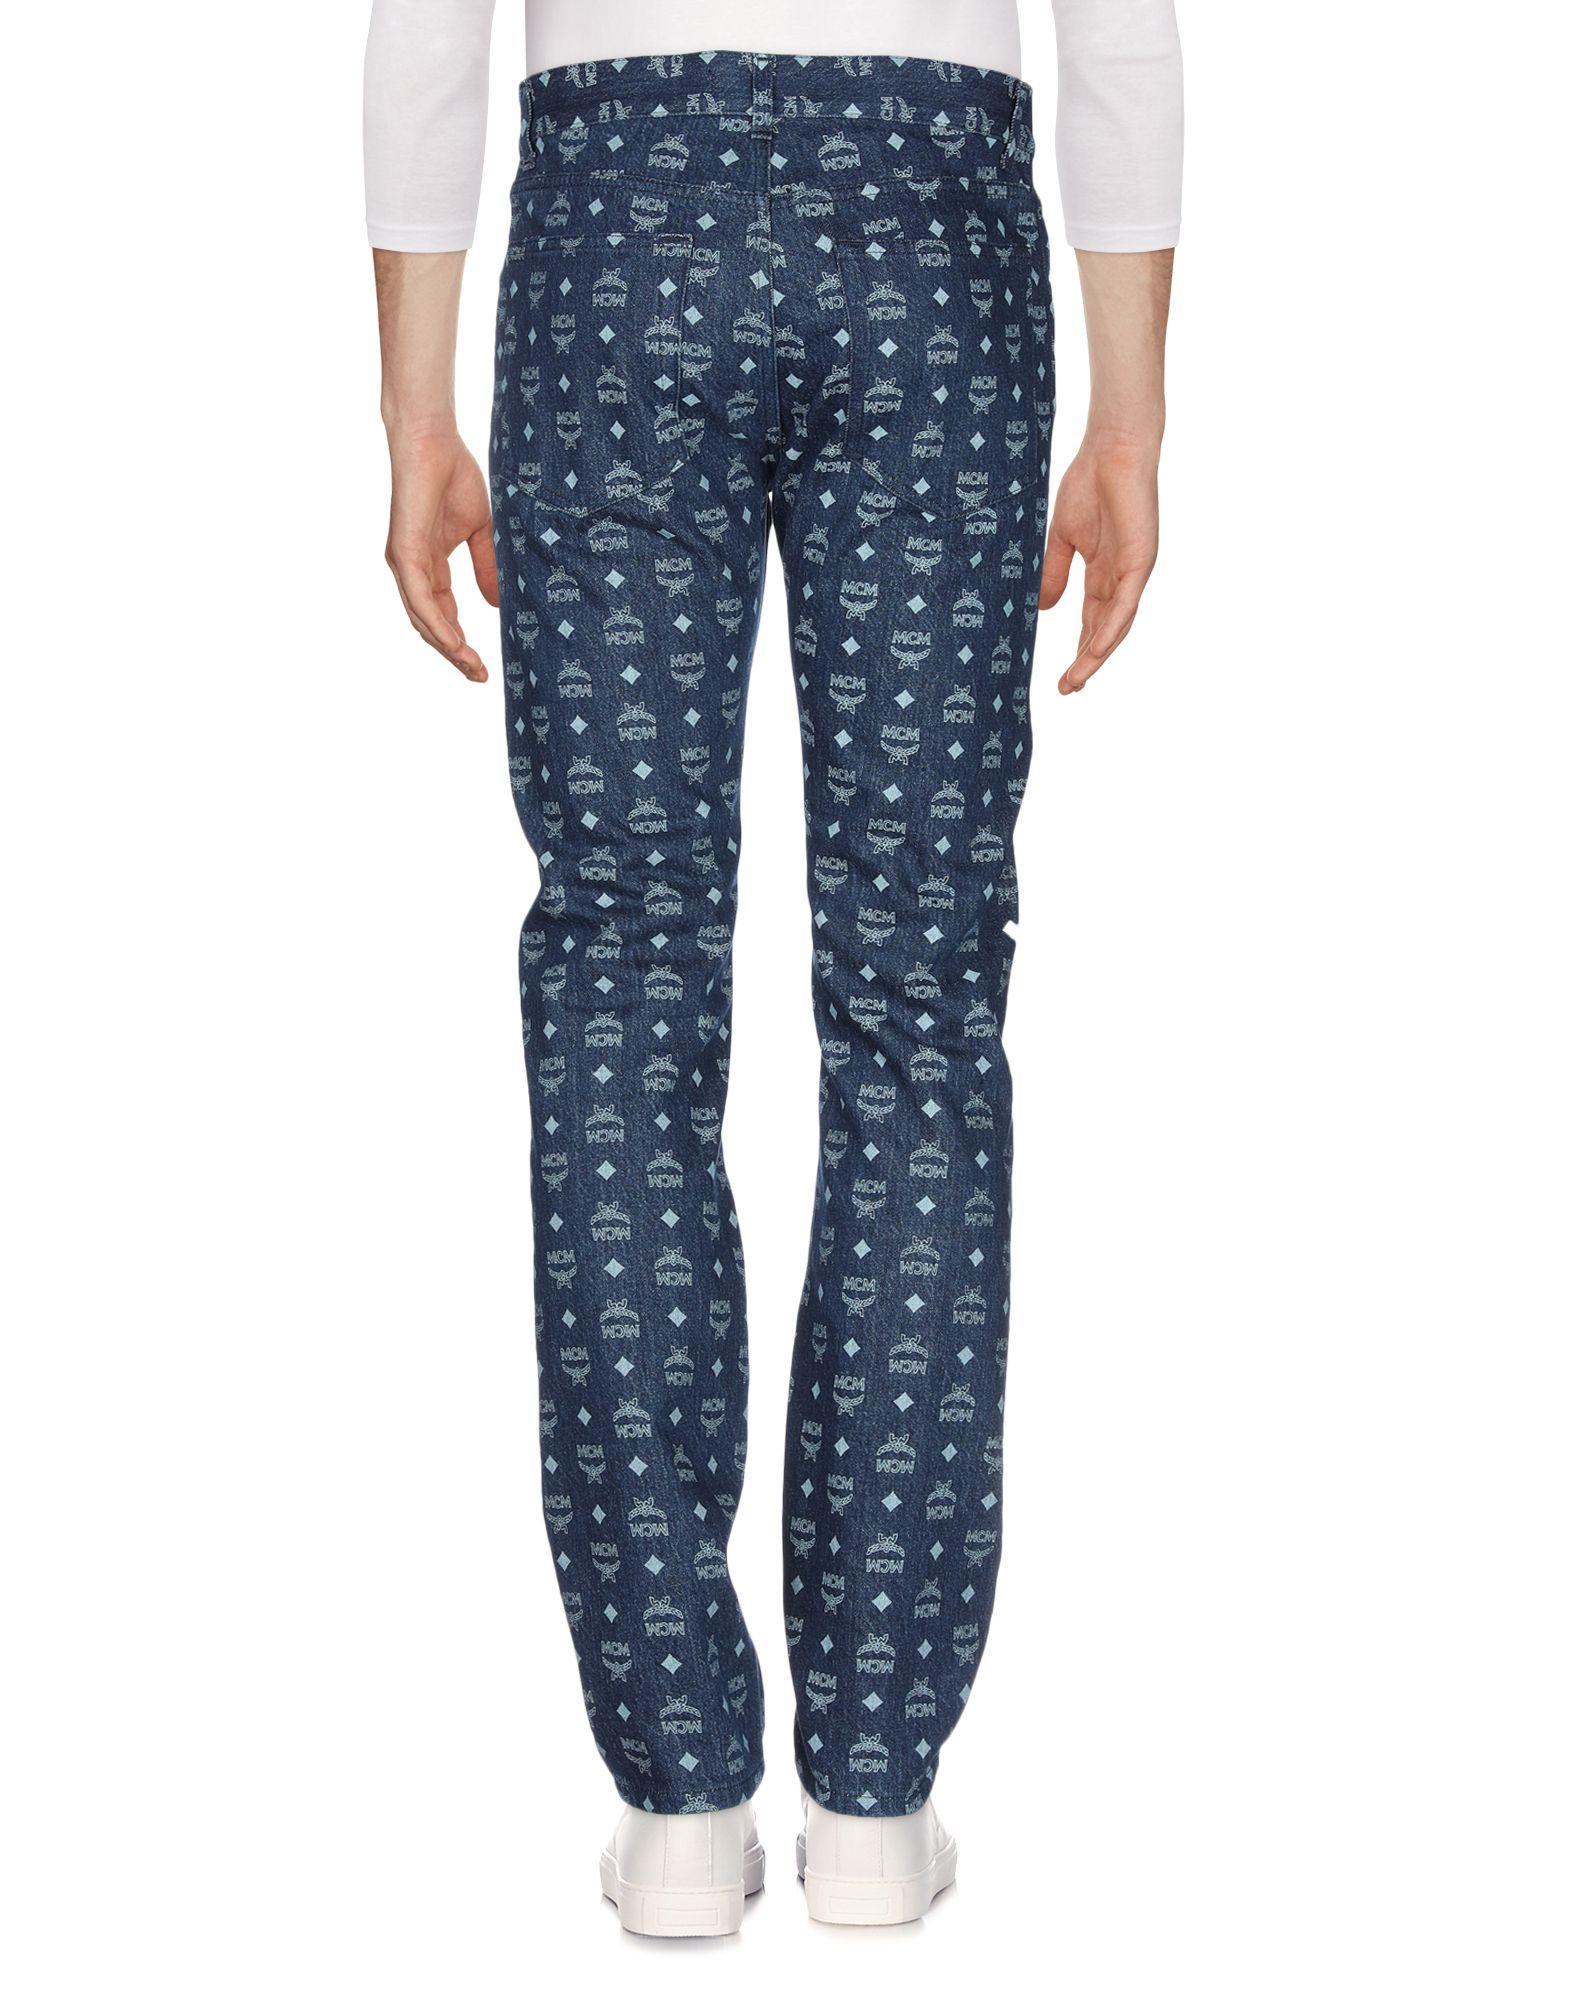 Pantalon en jean Jean MCM pour homme en coloris Bleu